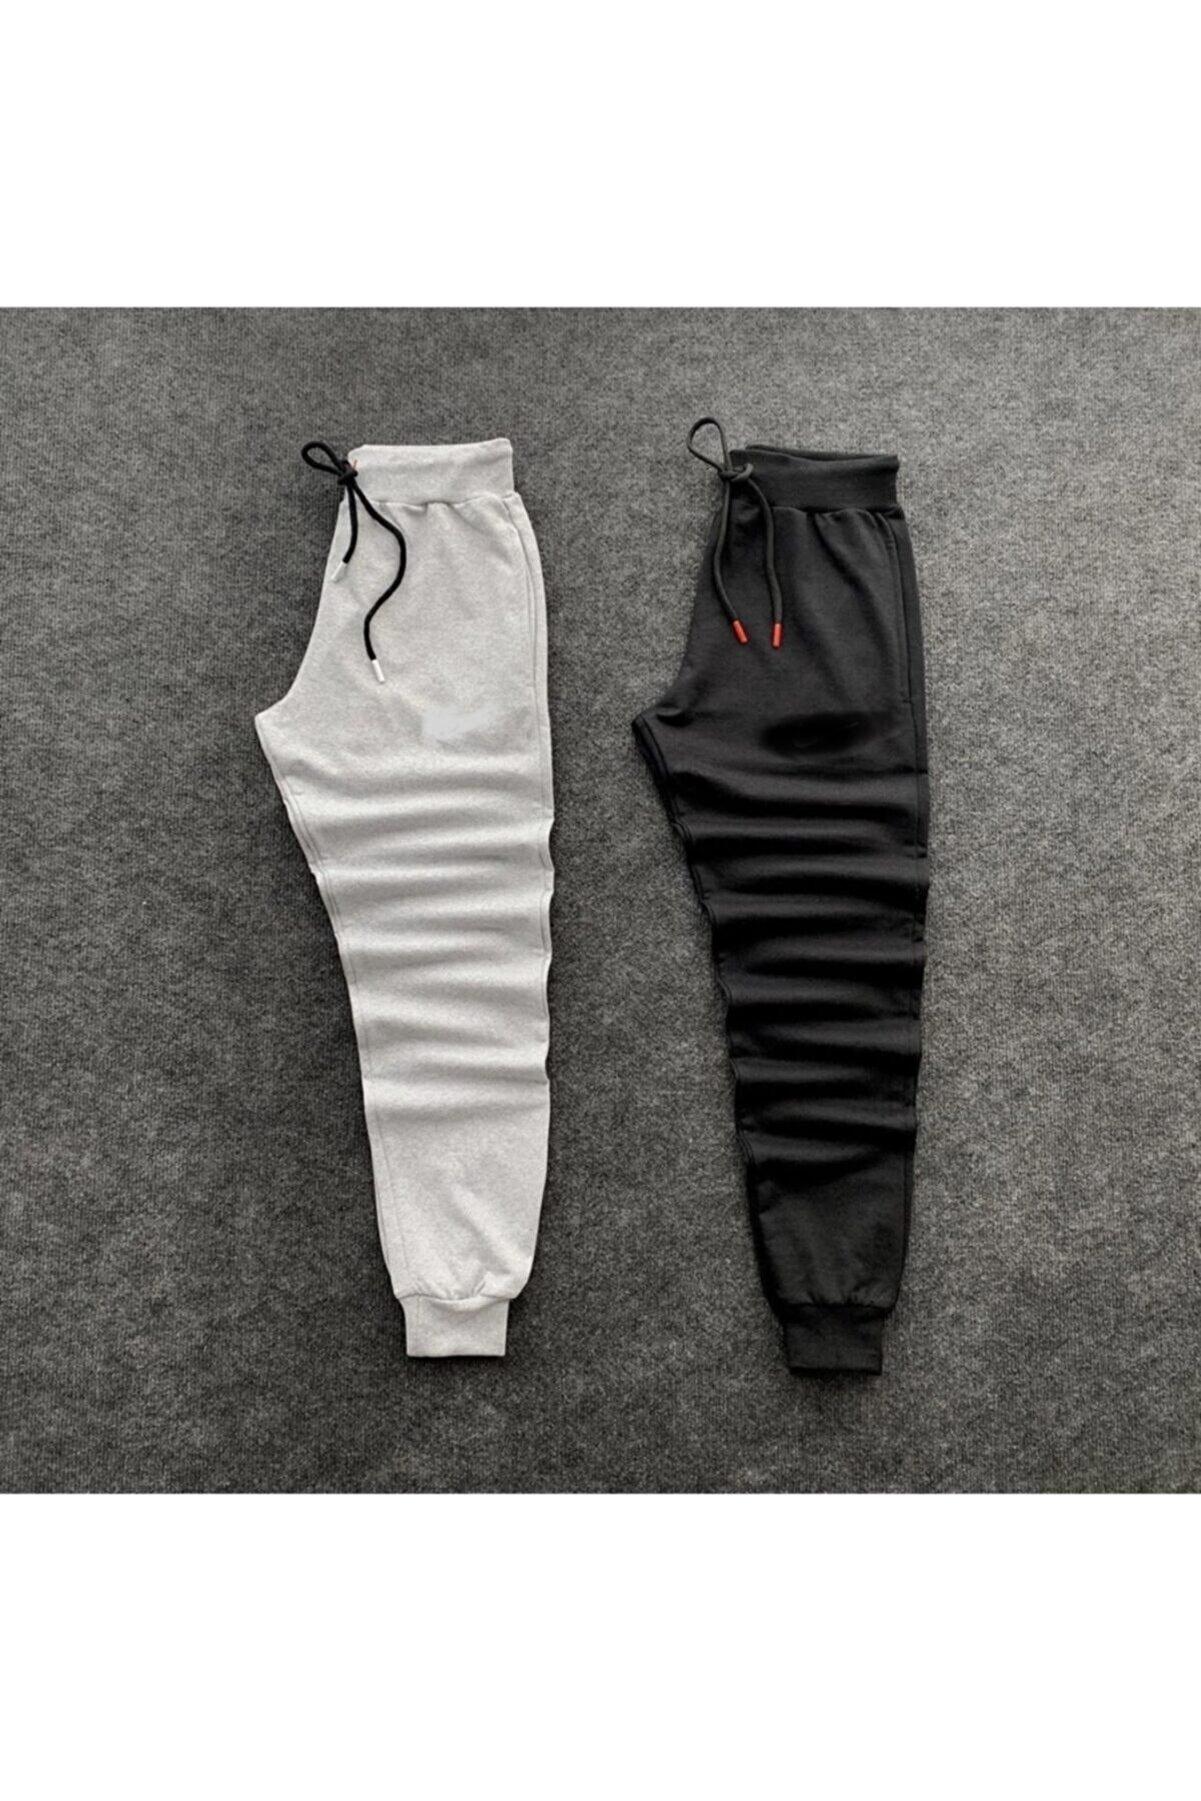 Lion Company Unisex Gri-siyah Slim Fit Çift Eşofman